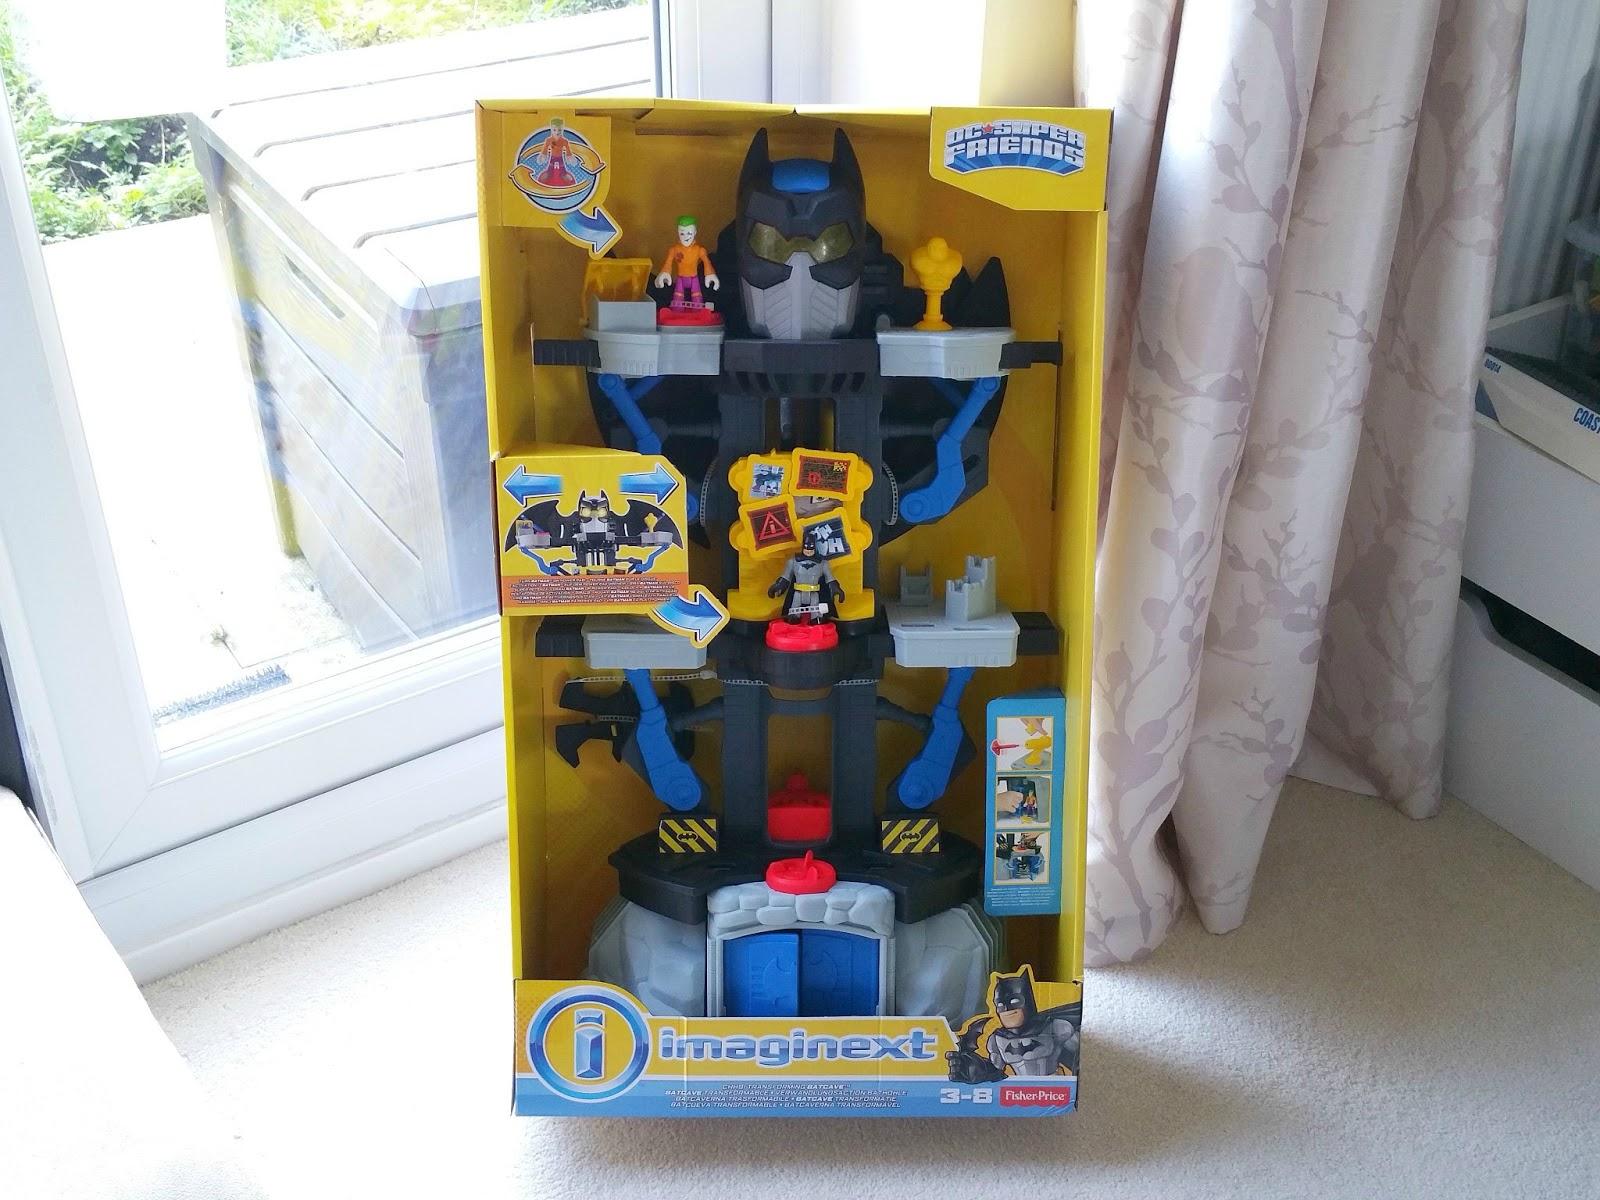 Christmas Batman gift, imaginext Transforming Batcave, Batman toy